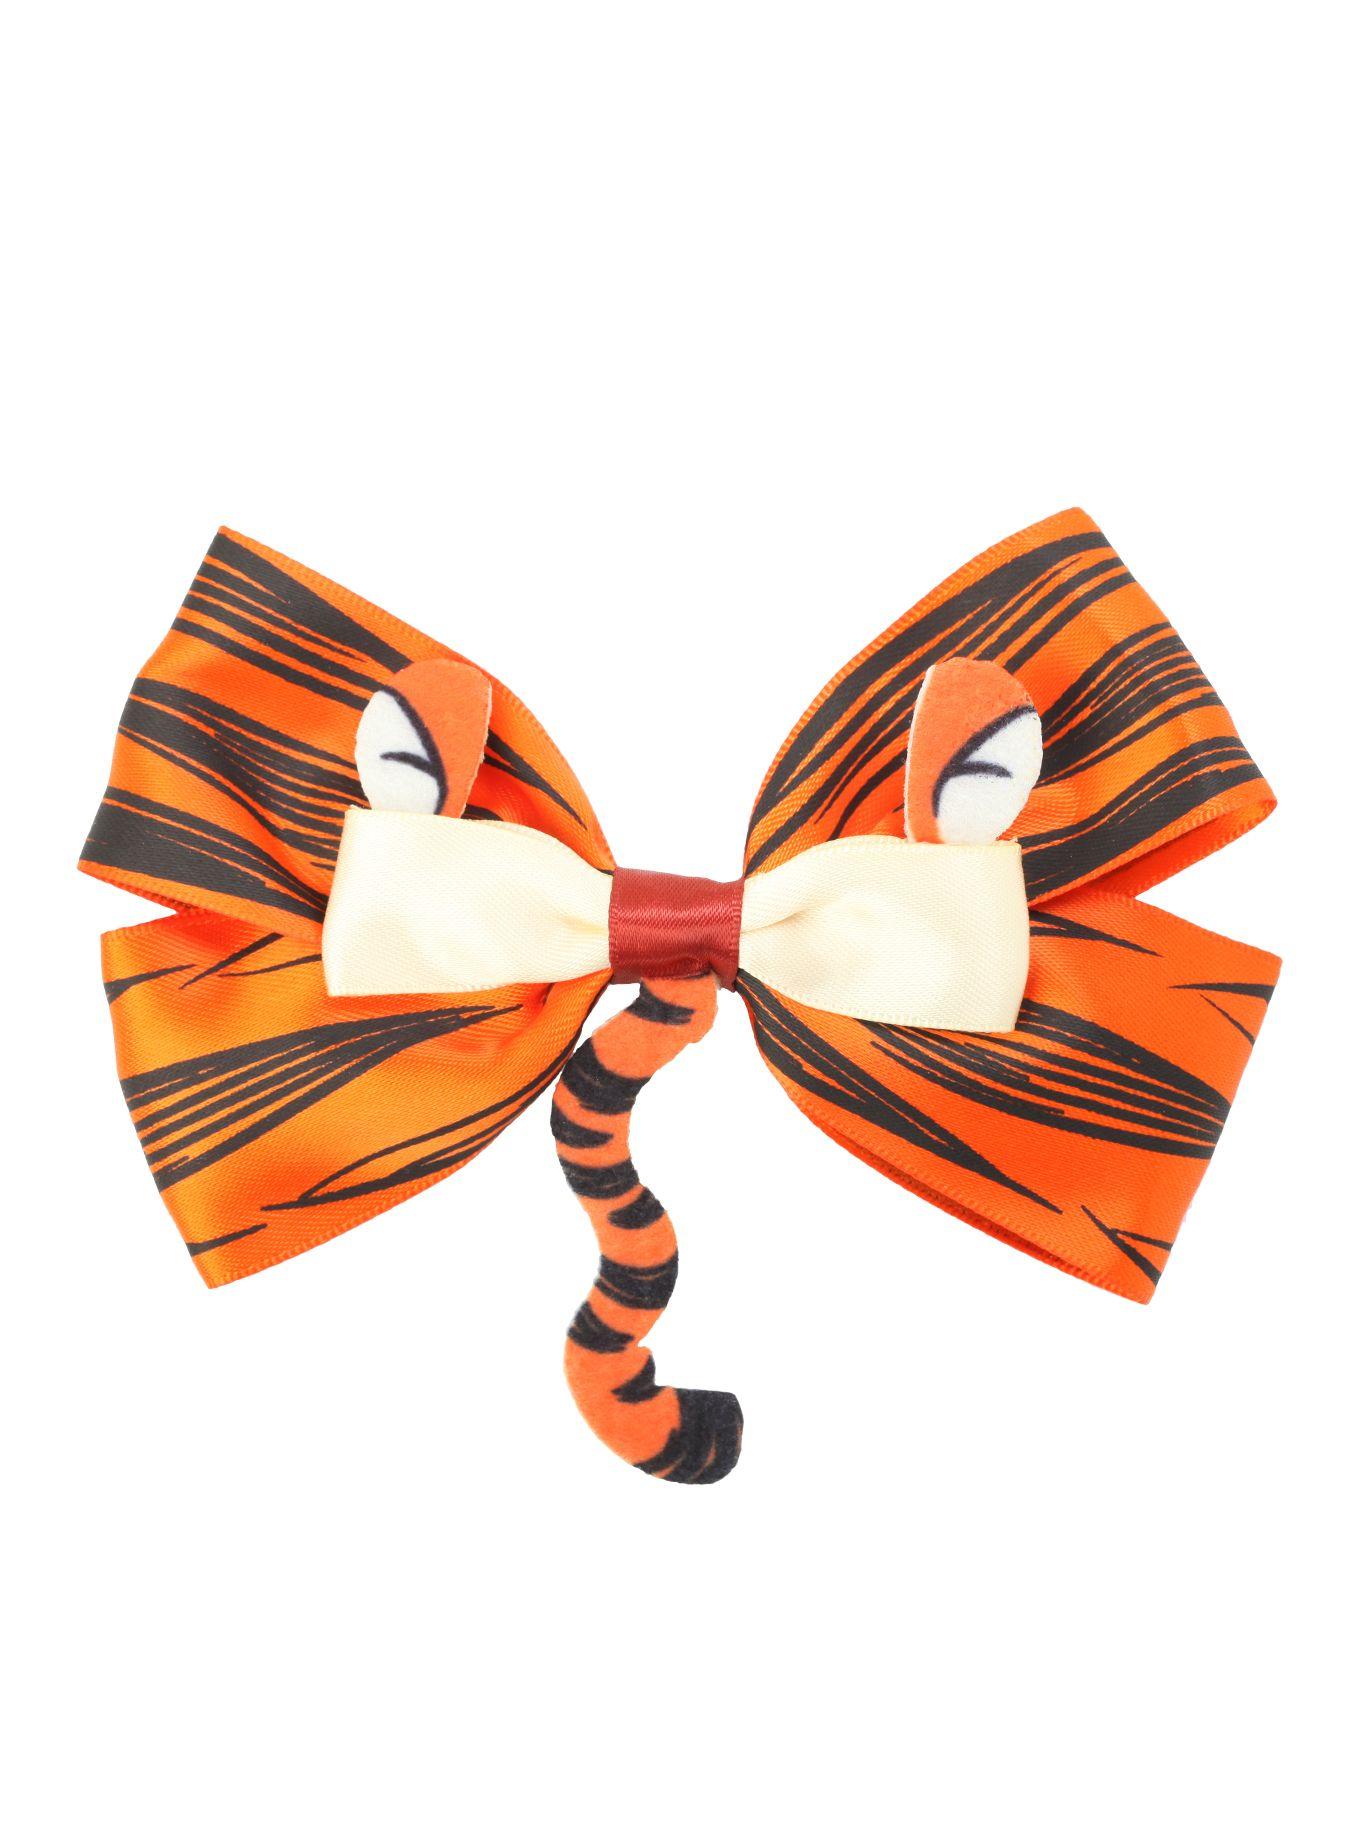 Disney Winnie The Pooh Tigger Cosplay Hair Bow   Hot Topic